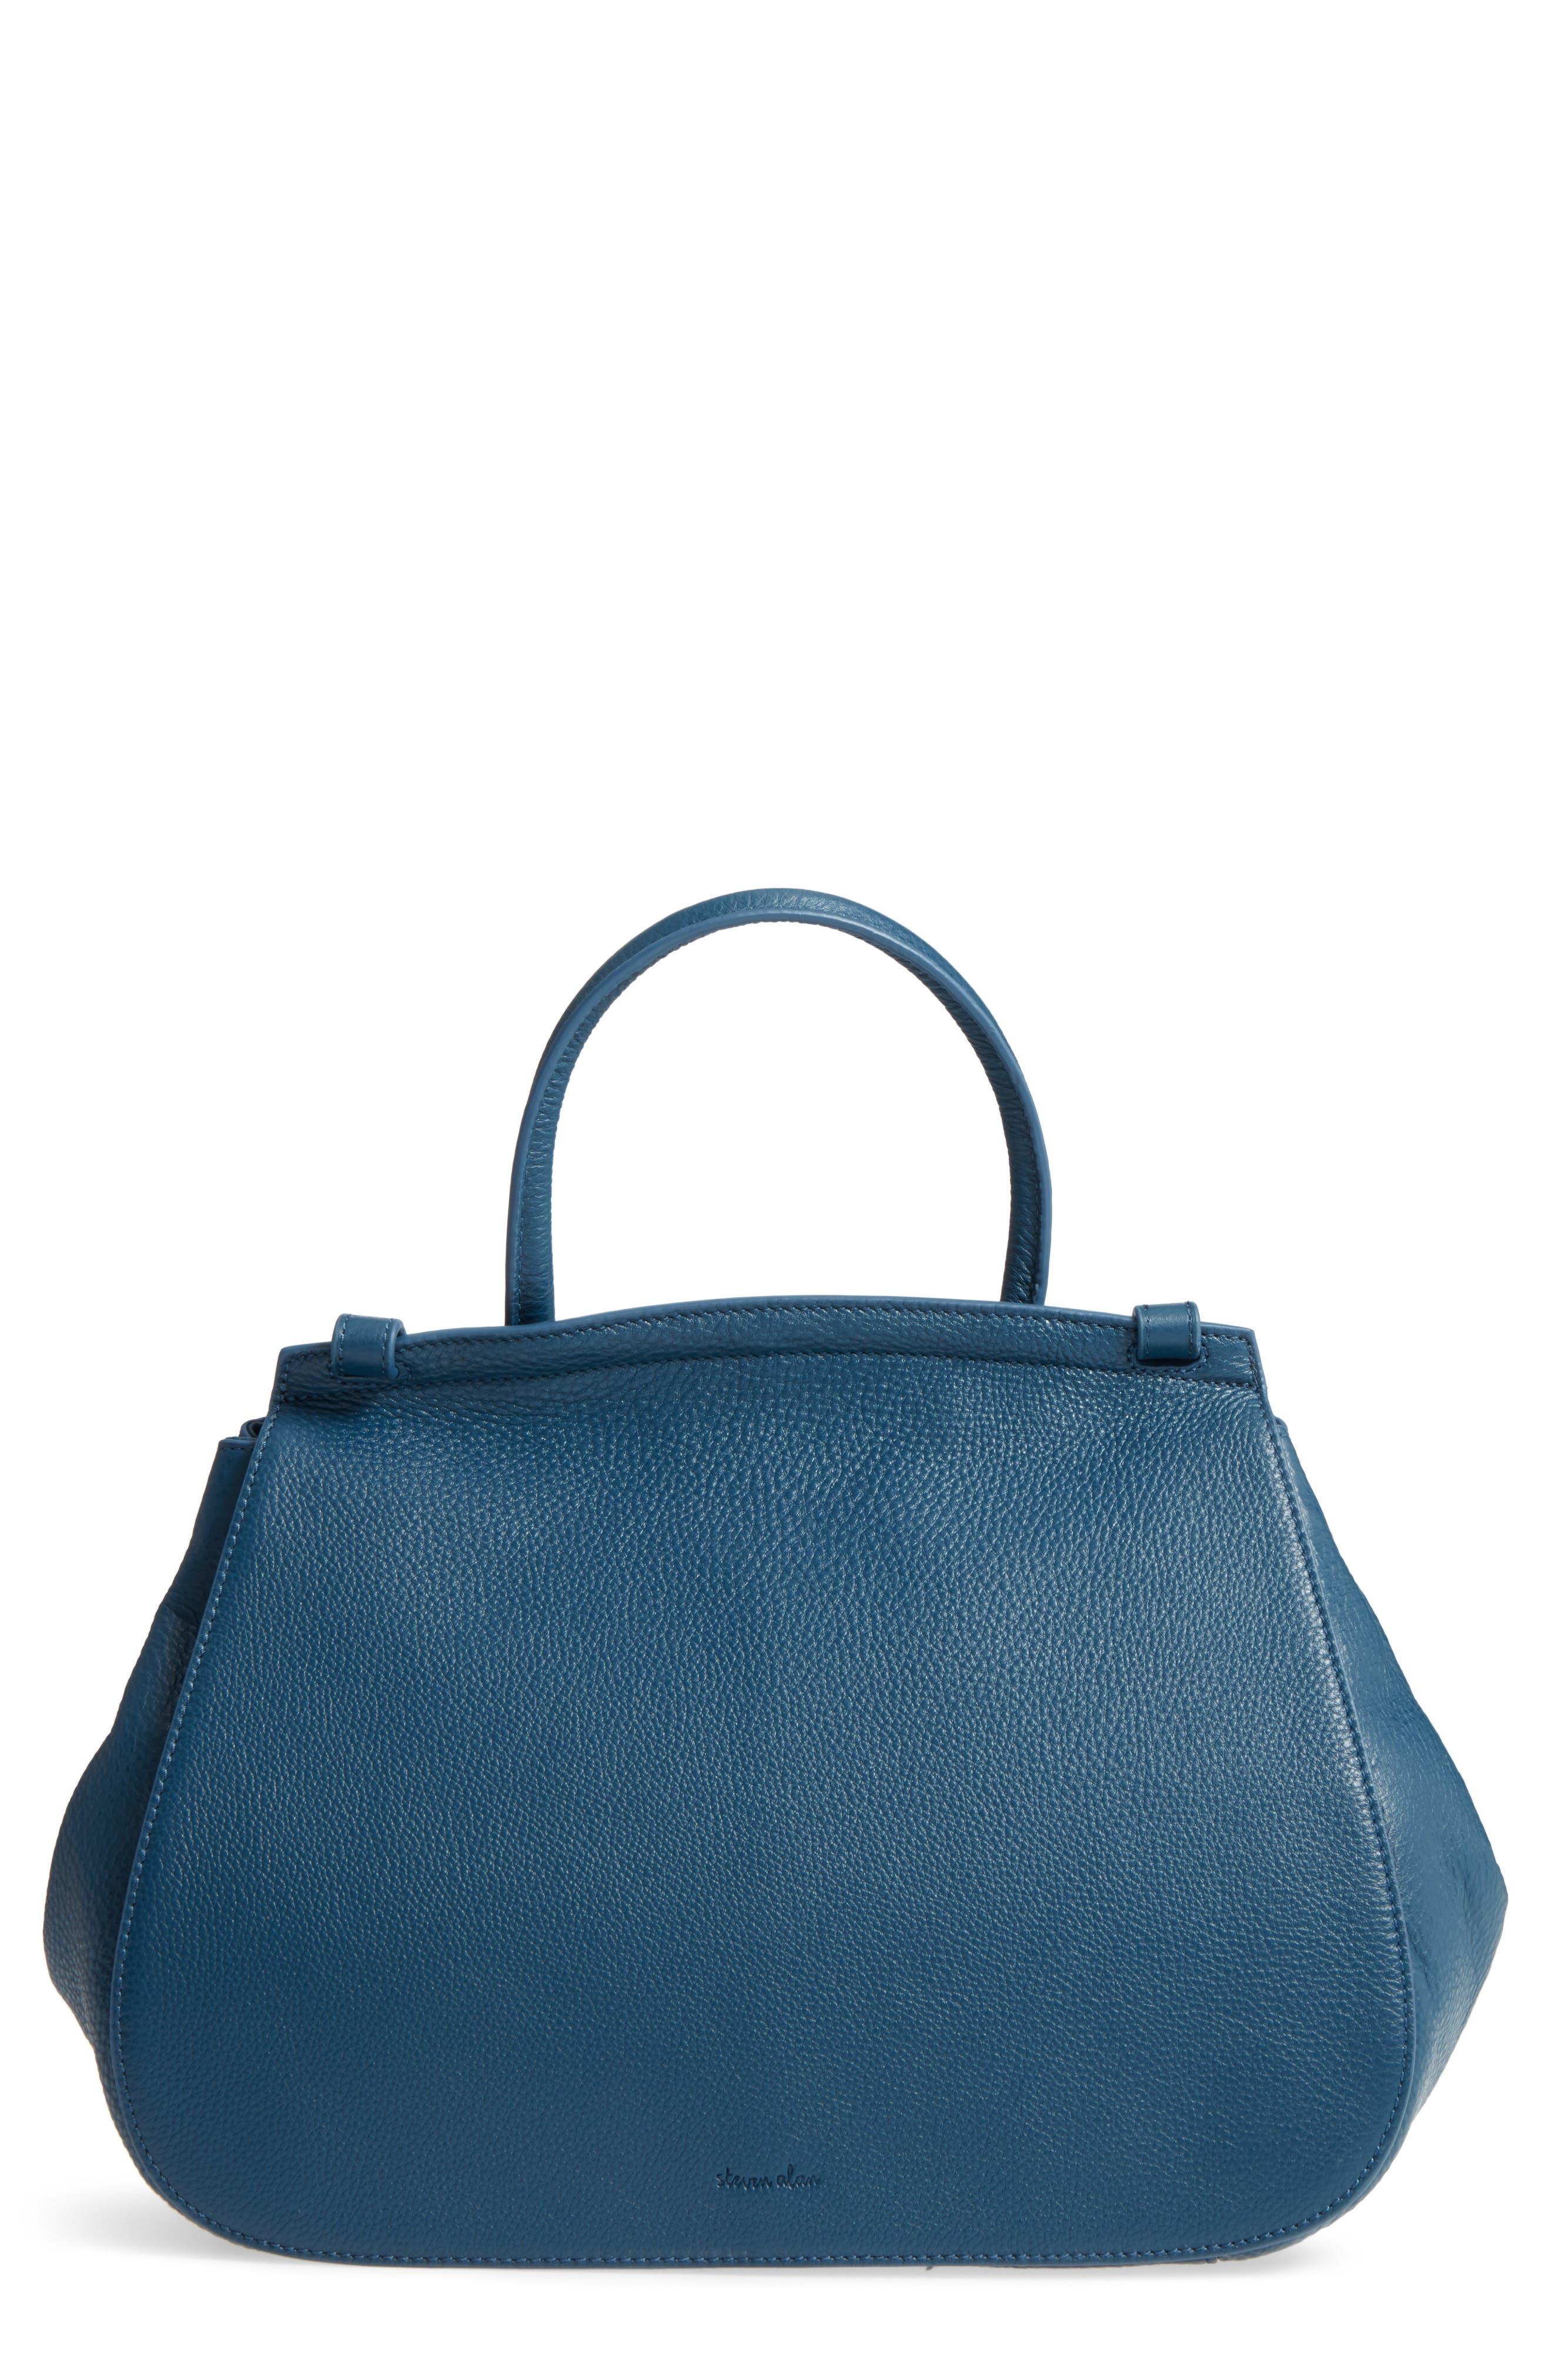 Kate Calfskin Leather Top Handle Satchel,                             Main thumbnail 1, color,                             Navy